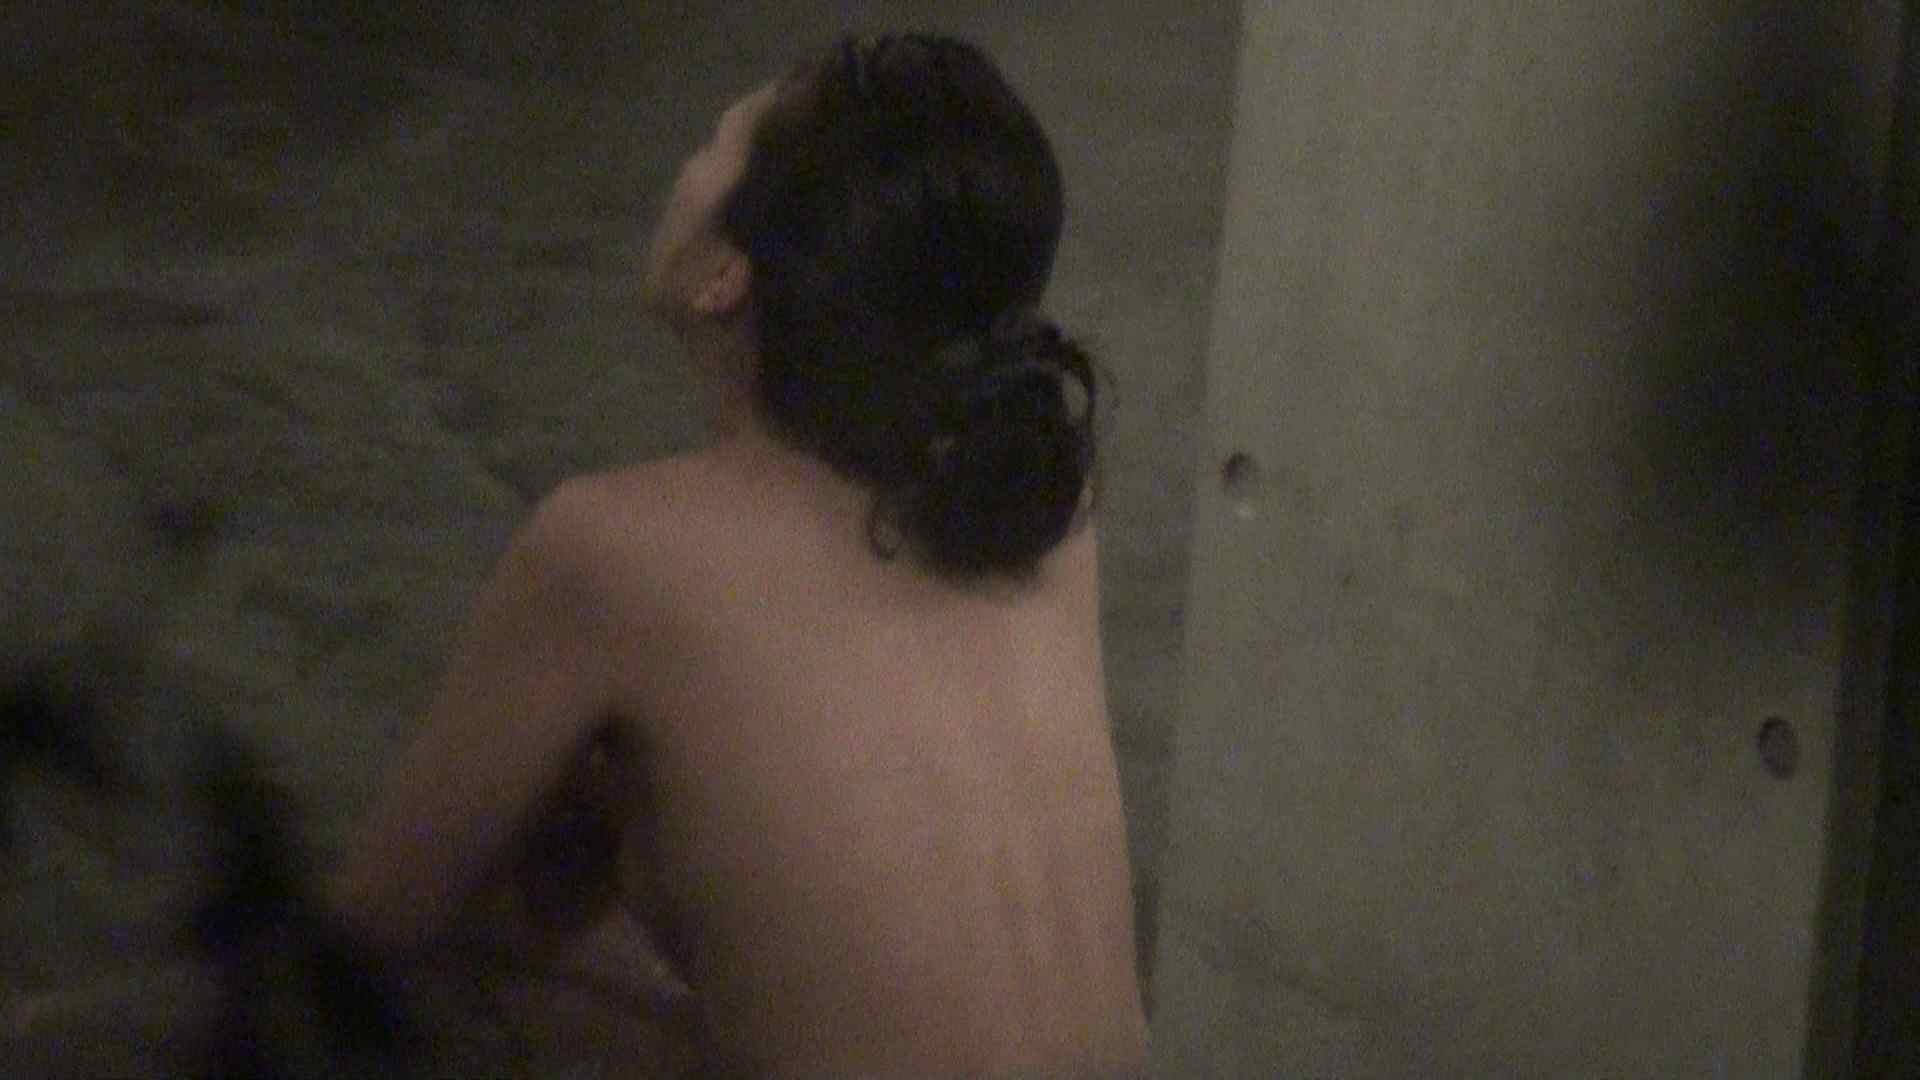 Aquaな露天風呂Vol.375 露天 盗撮セックス無修正動画無料 106連発 80